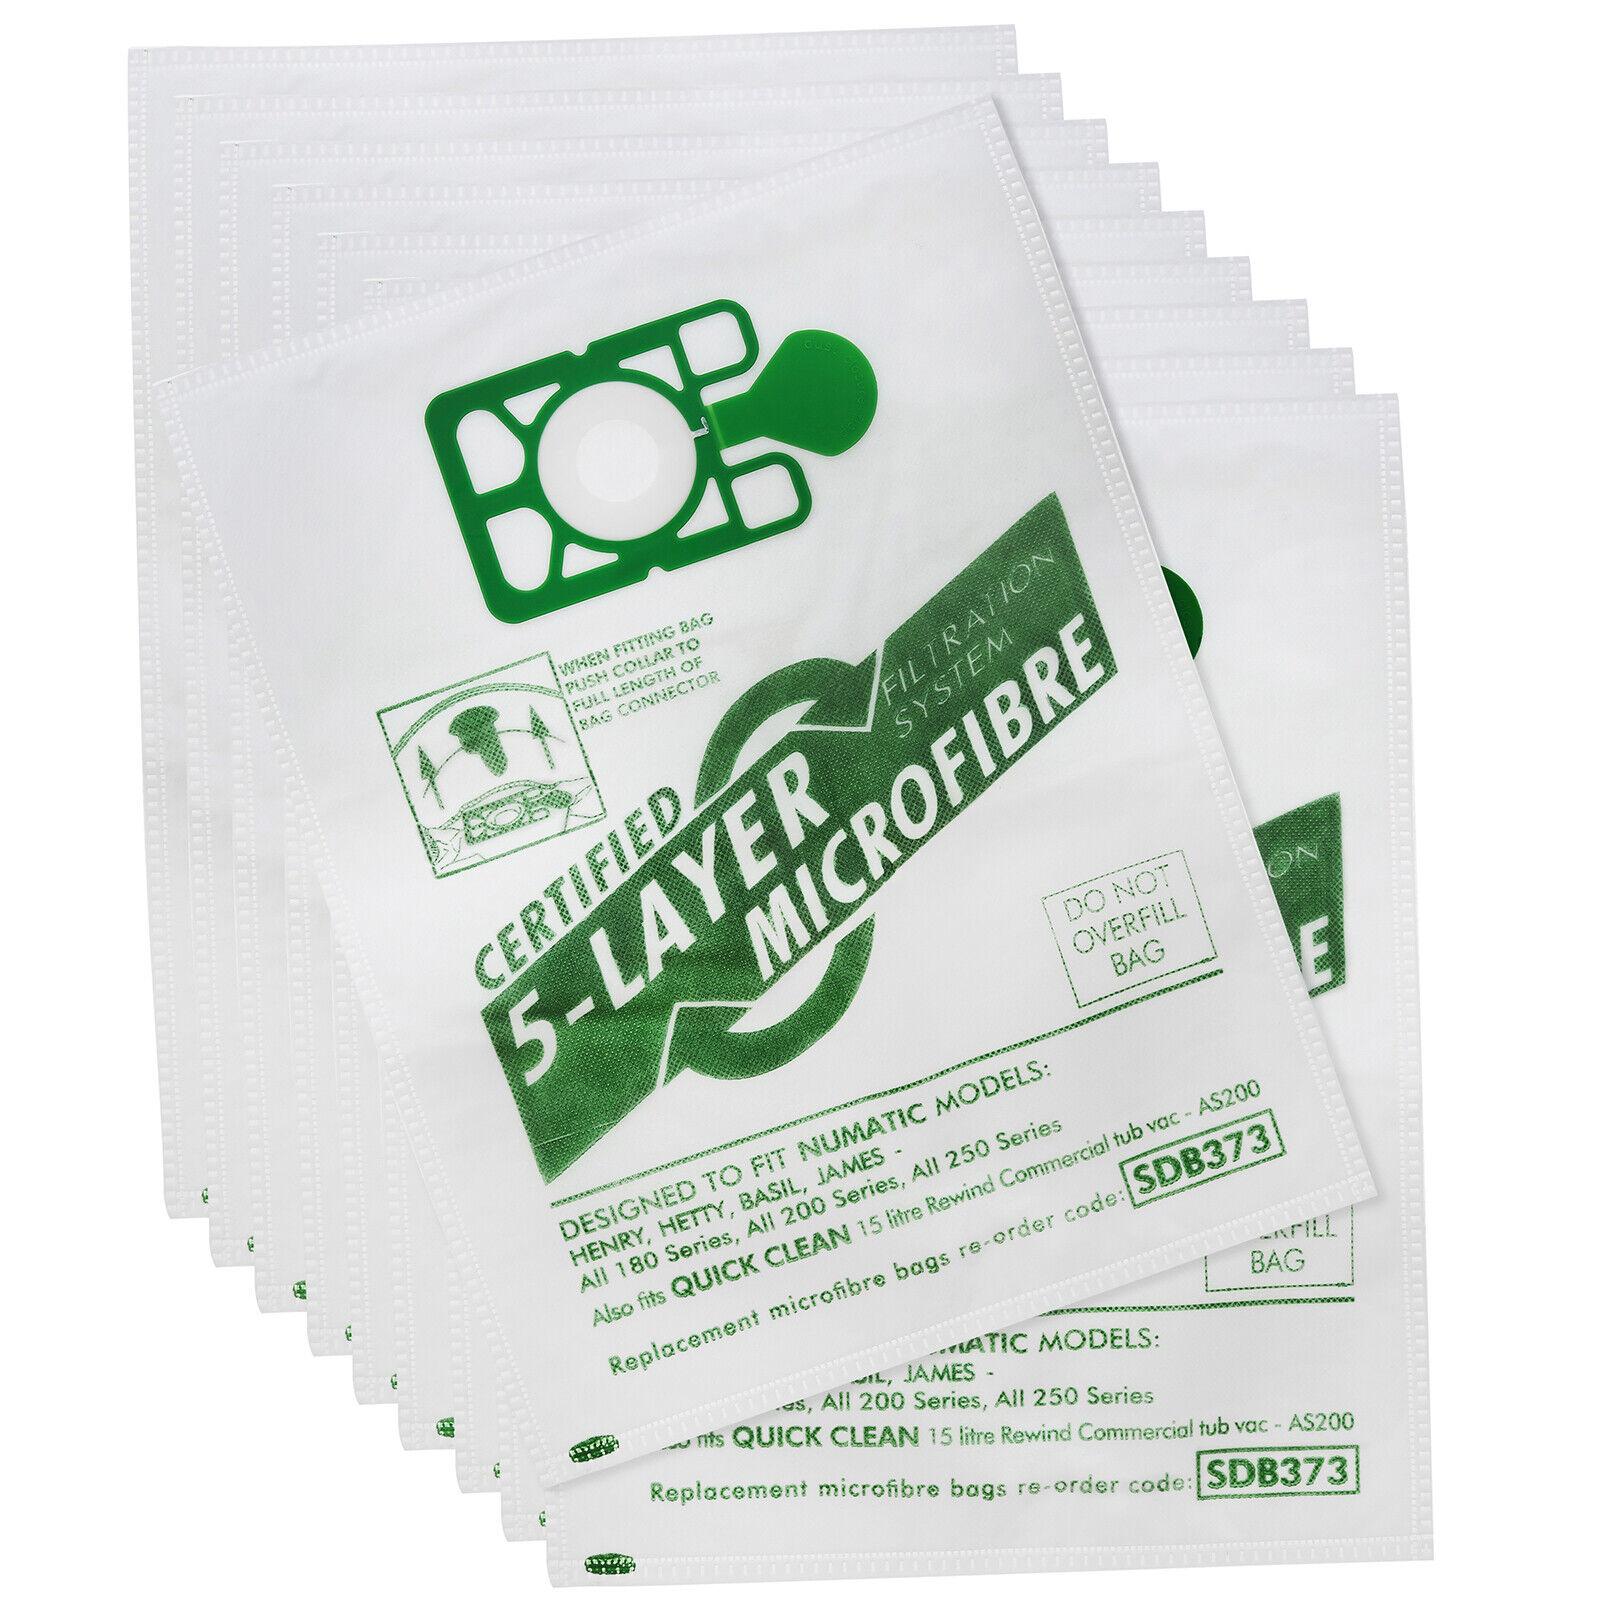 Dust Bags x 10 for Numatic Hetty Harry James HET200 HHR200 Vacuum Microfibre